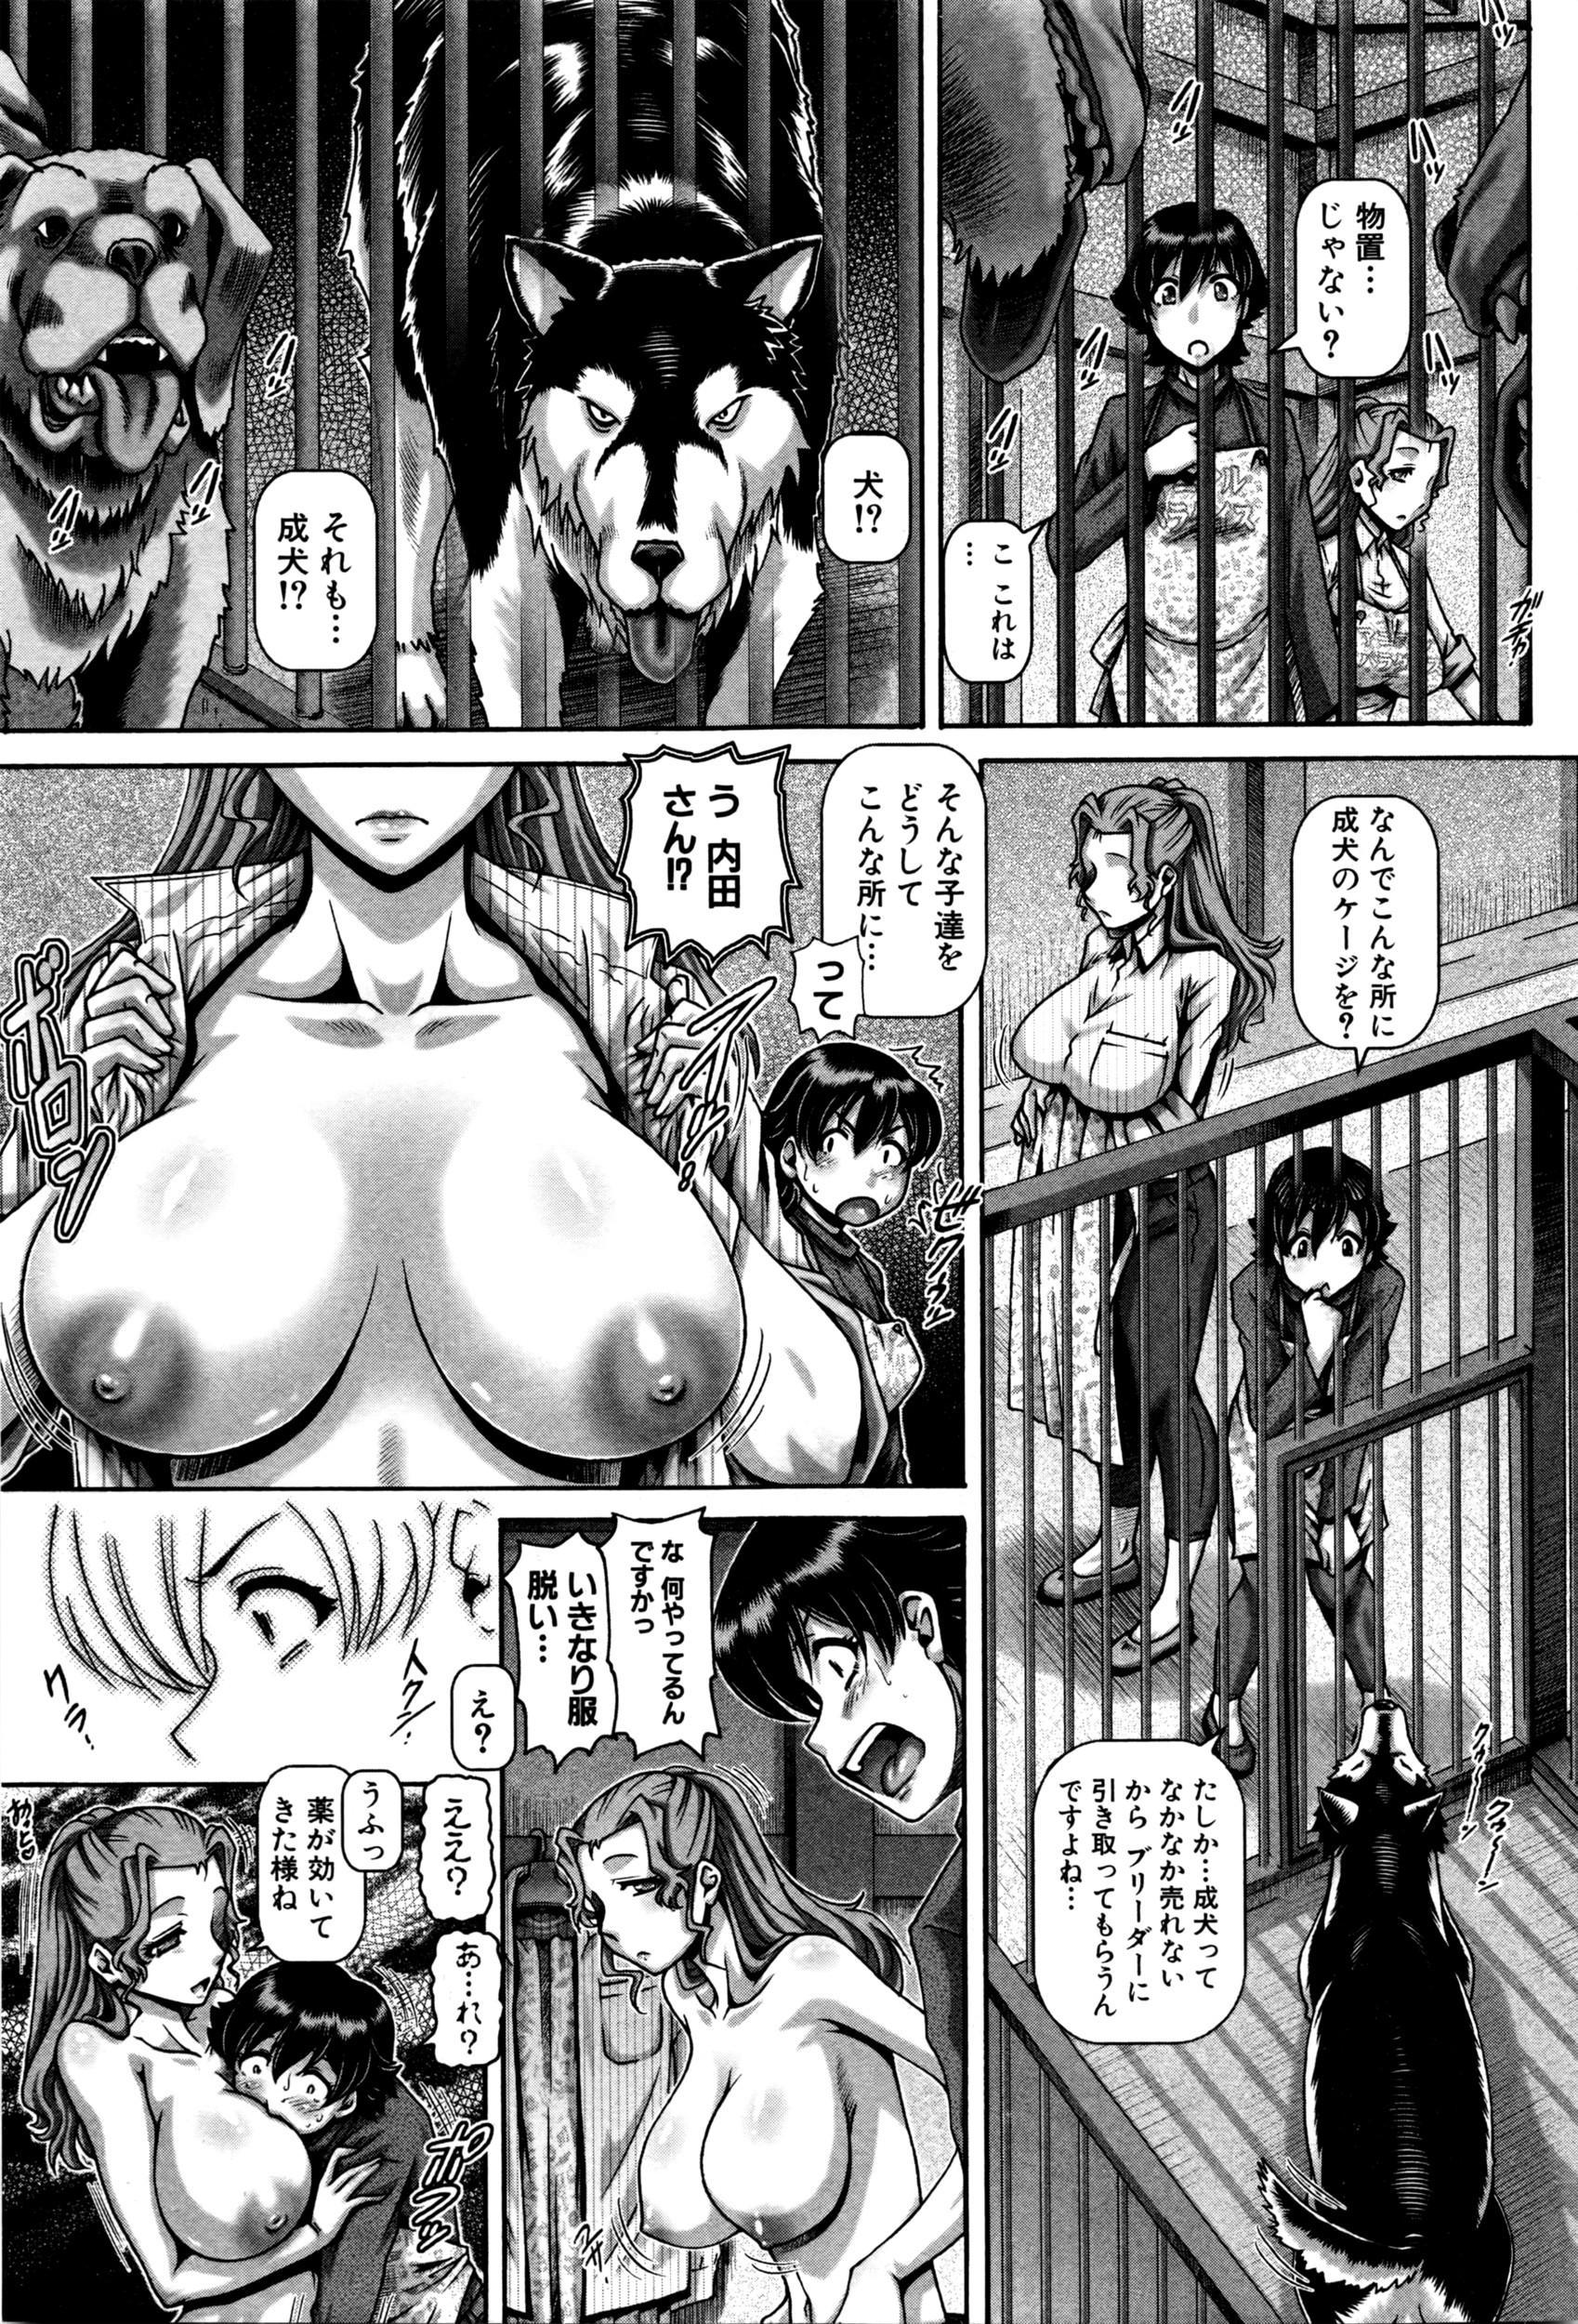 雌への付加家畜 - COMIC MILF Vol.30 COMIC 夢幻転生 2016年6月号増刊 2